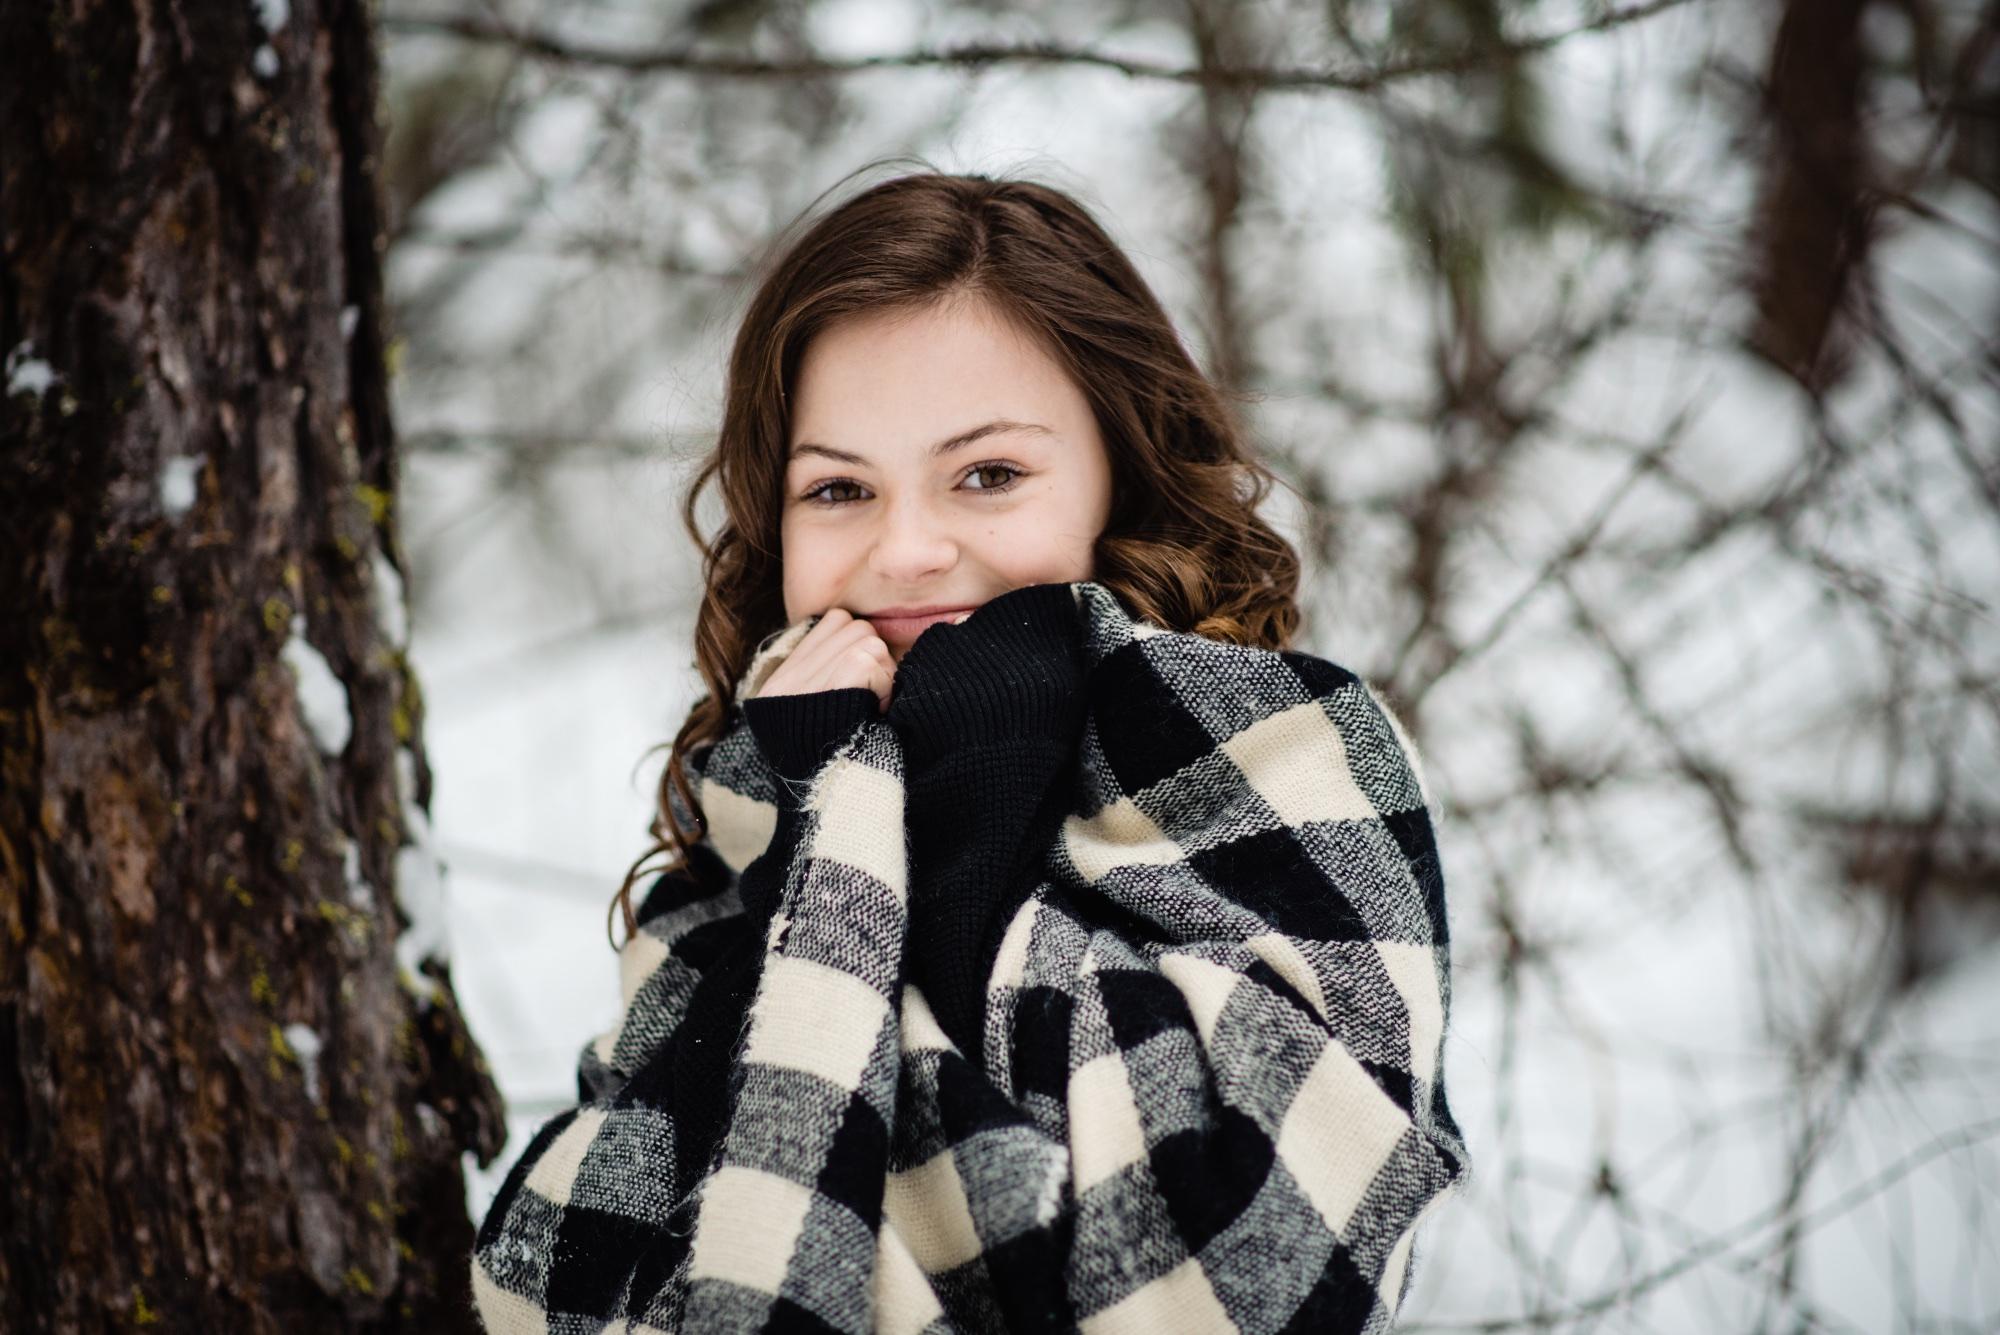 lindseyjanephotography_teens013.jpg